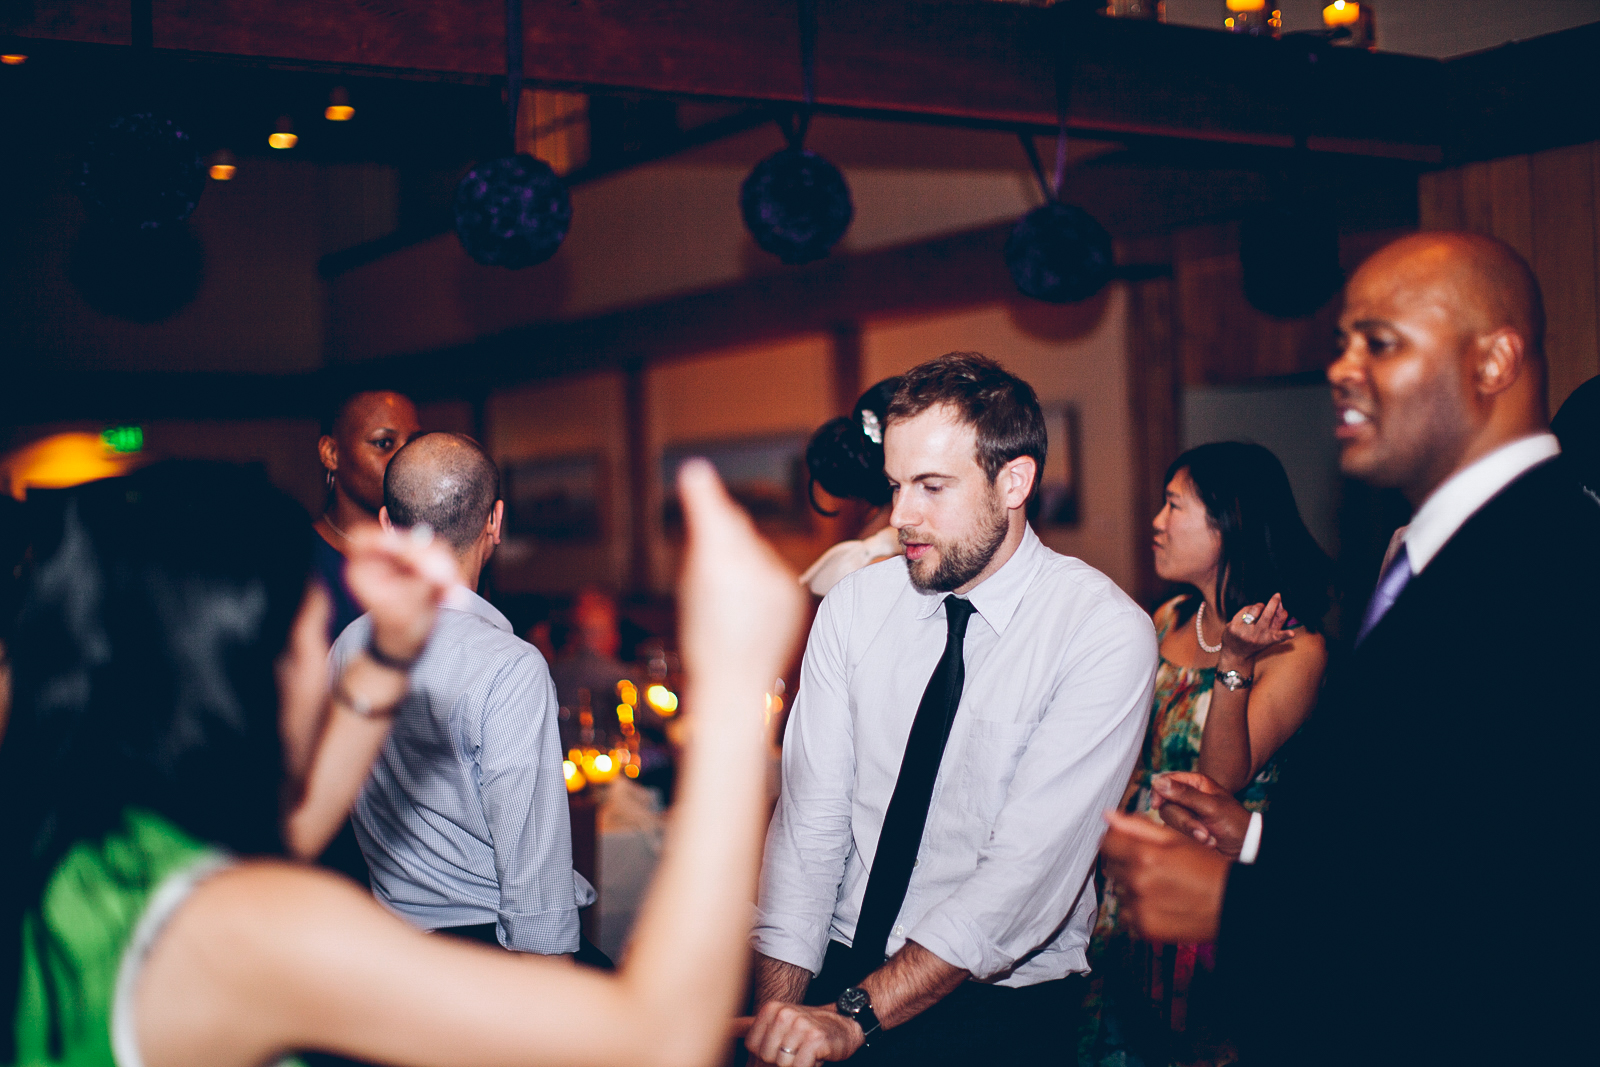 greens_restaurant_wedding_photography_san_franscisco_ebony_siovhan_bokeh_photography_79.jpg